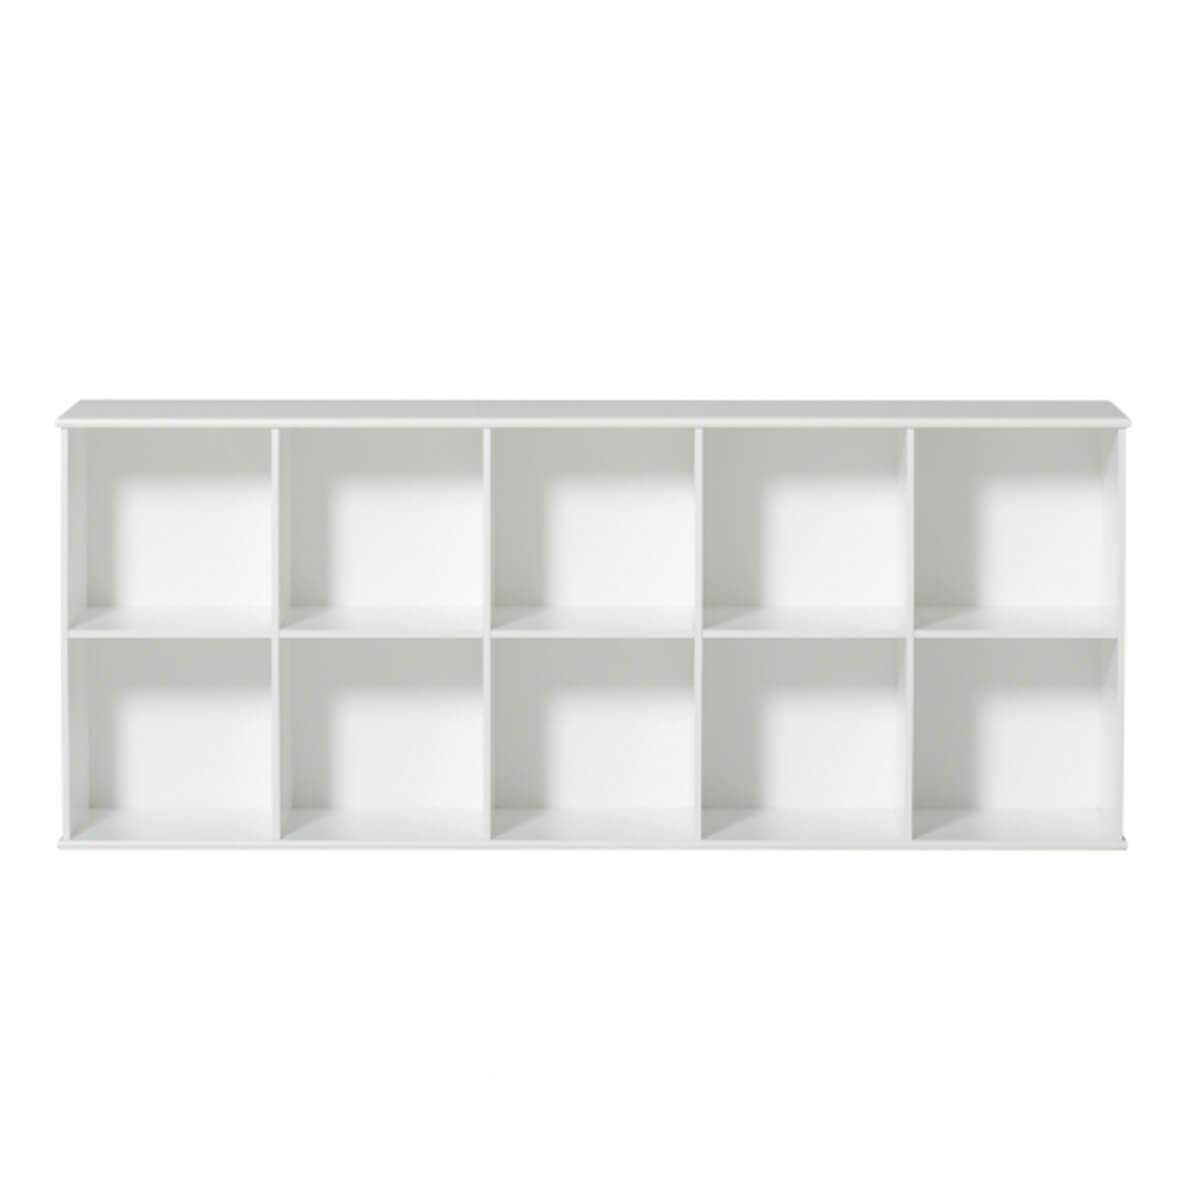 Estantería 174x71cm WOOD Oliver Furniture blanco